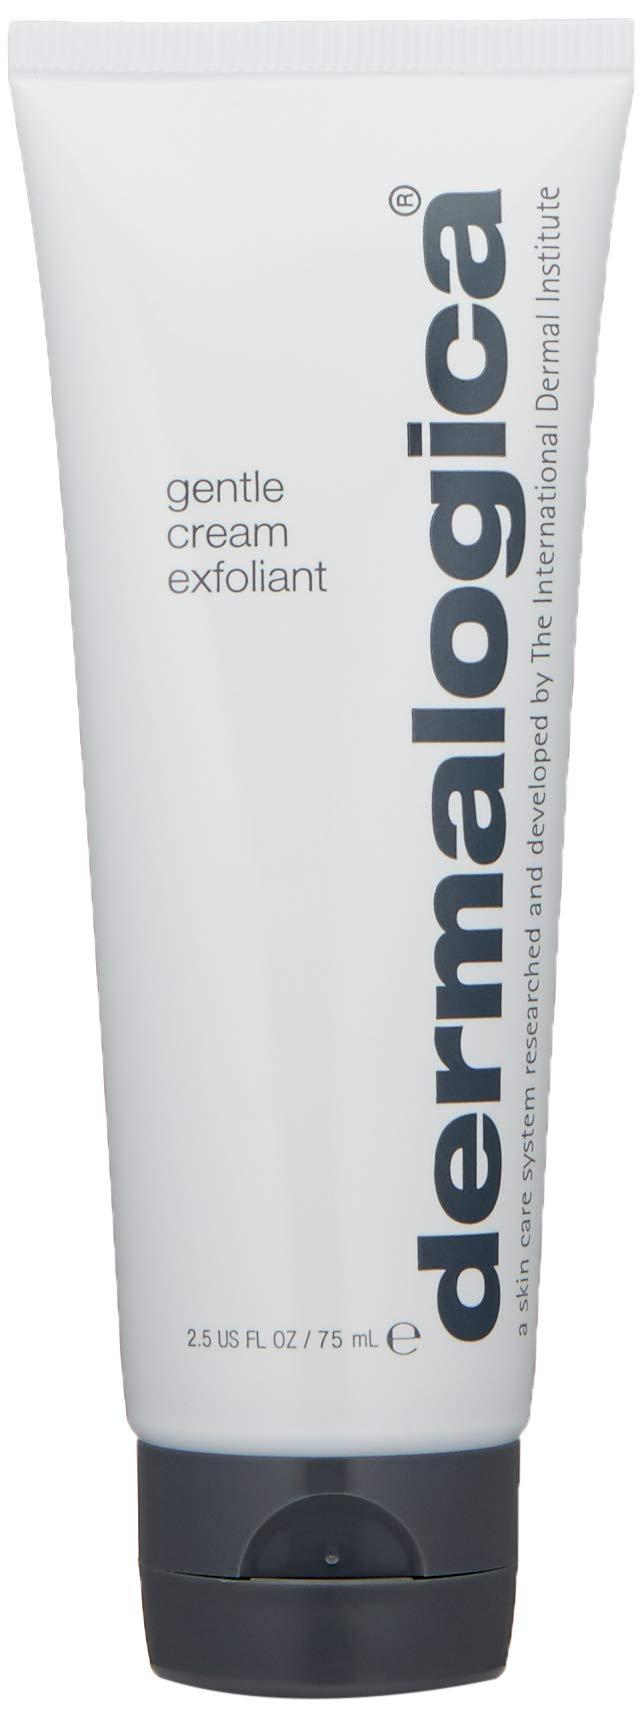 Dermalogica Gentle Cream Exfoliant, 2.5 Fl Oz by DERMALOGICA